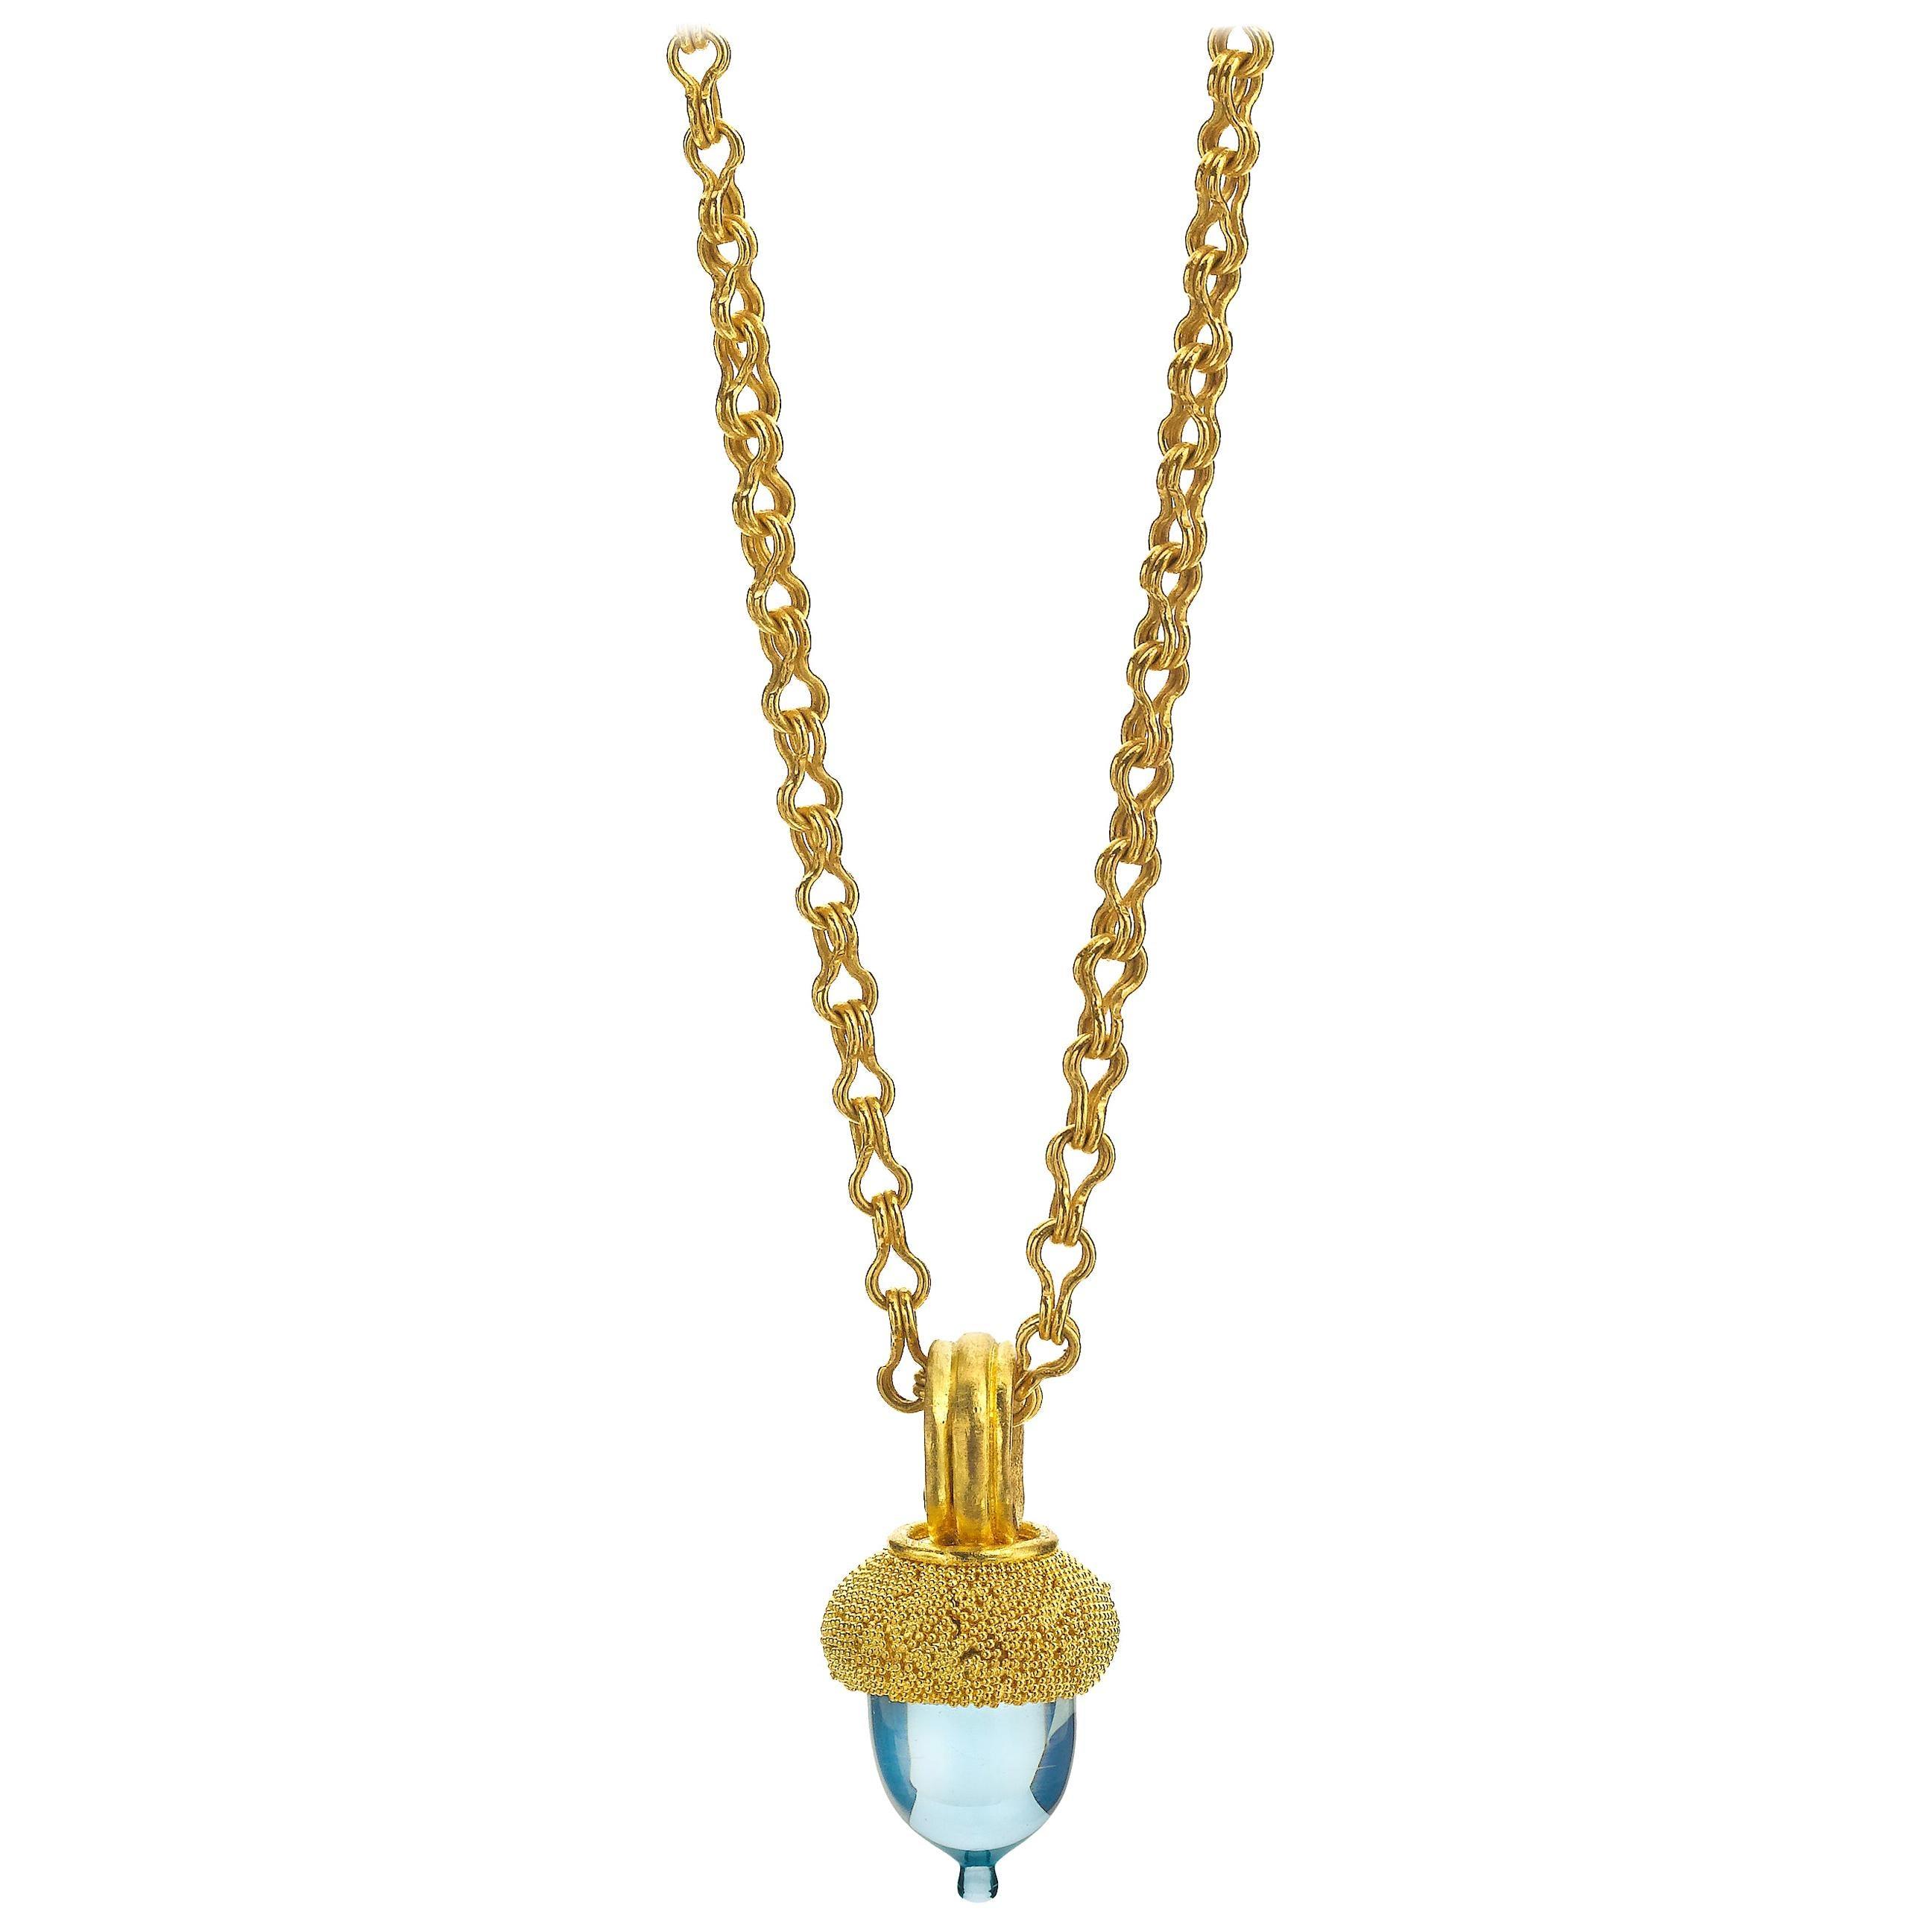 Topaz and 22 Karat Gold Acorn Pendant